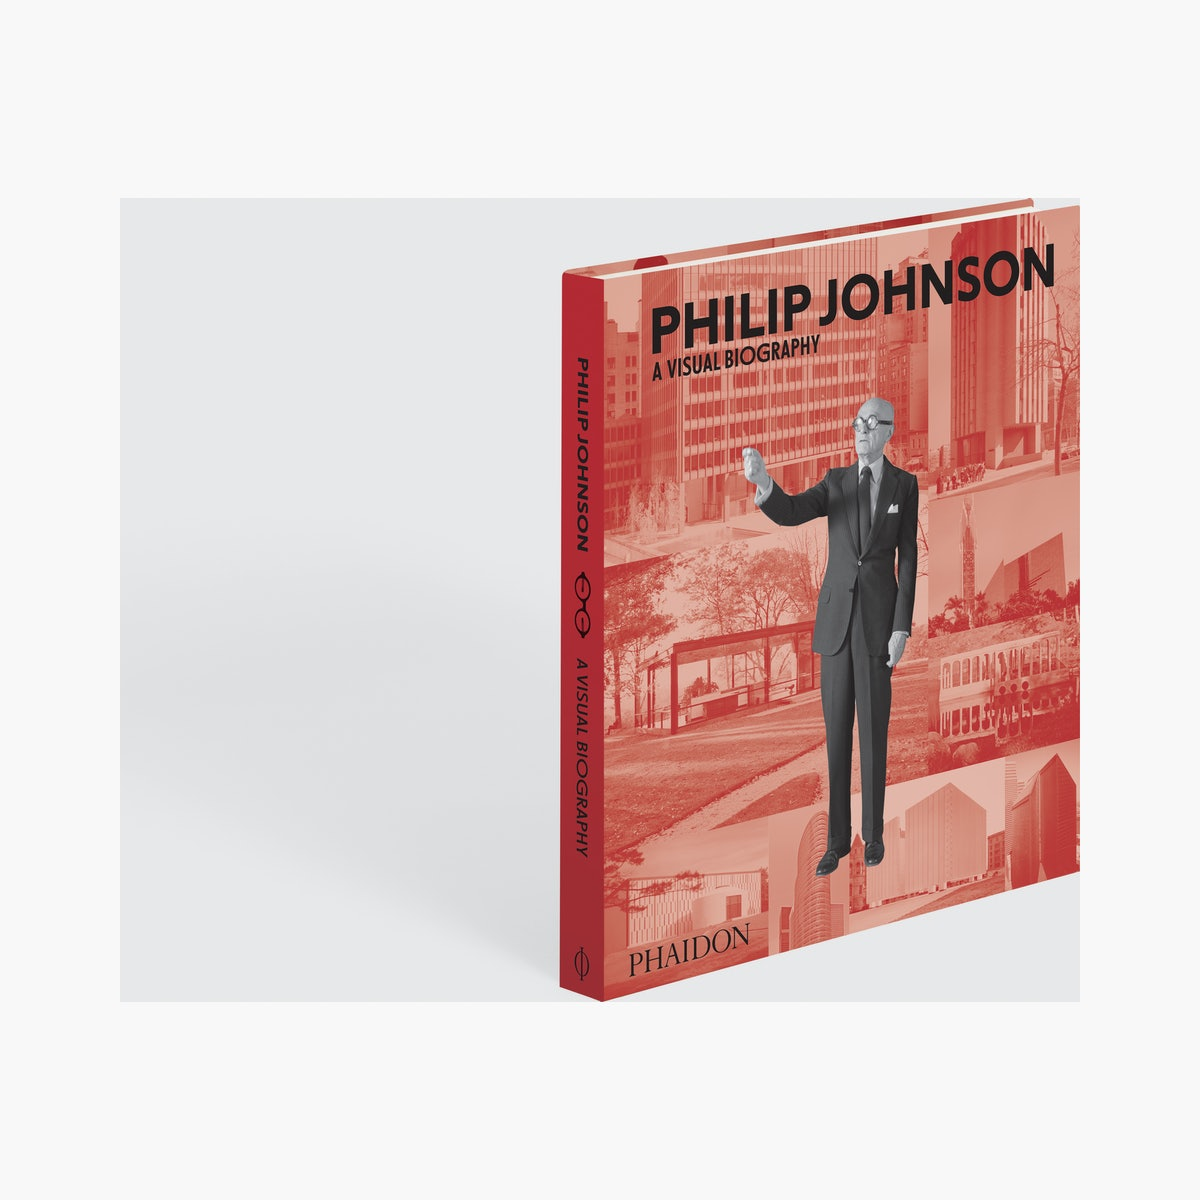 Philip Johnson - A Visual Biography